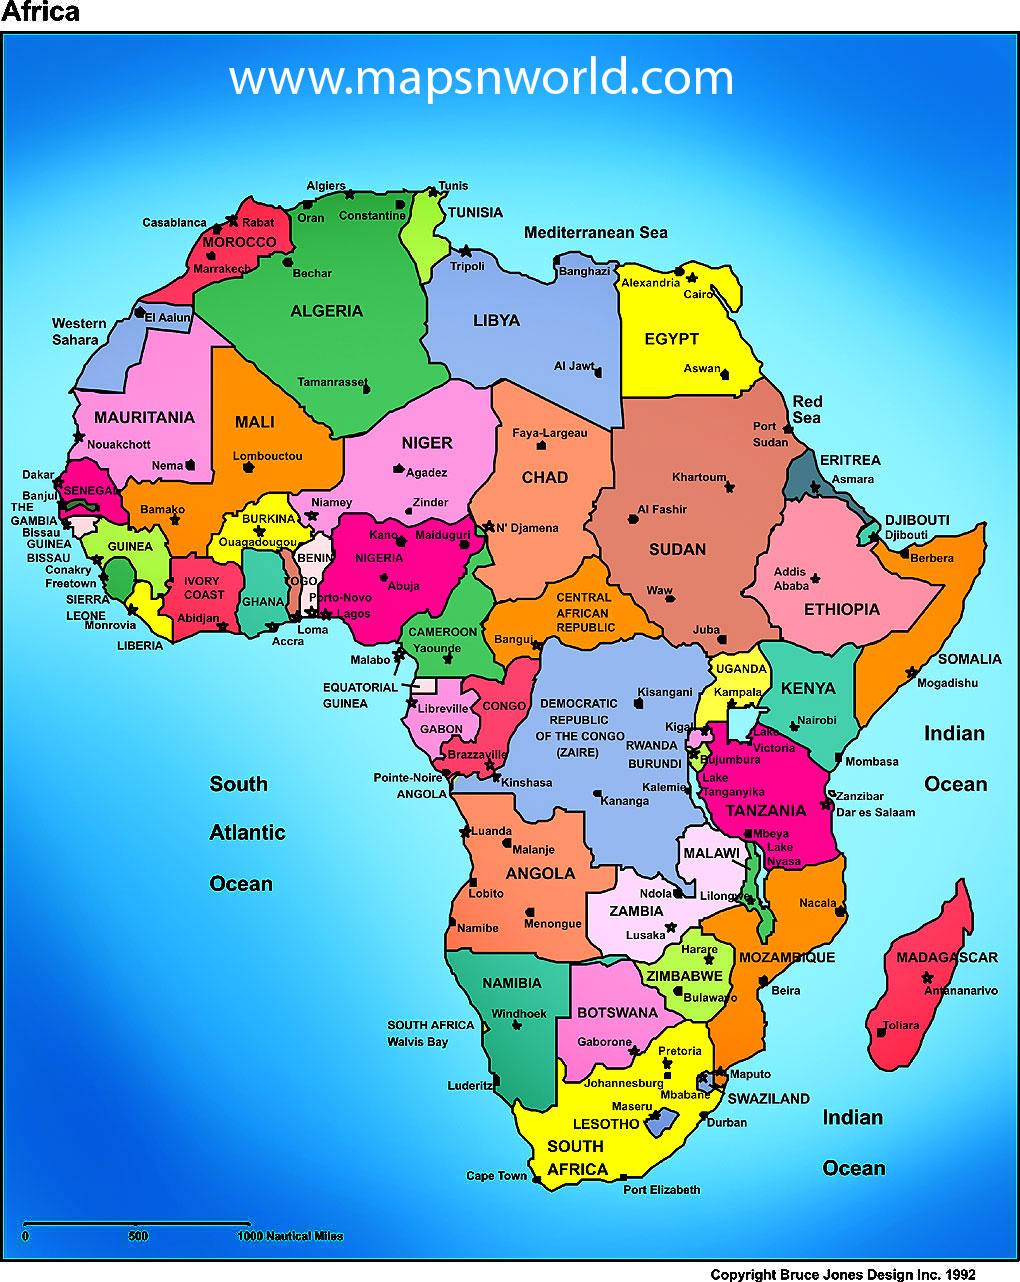 High Resolution Blank Political Map Of Africa.57 Africa Map Wallpaper On Wallpapersafari